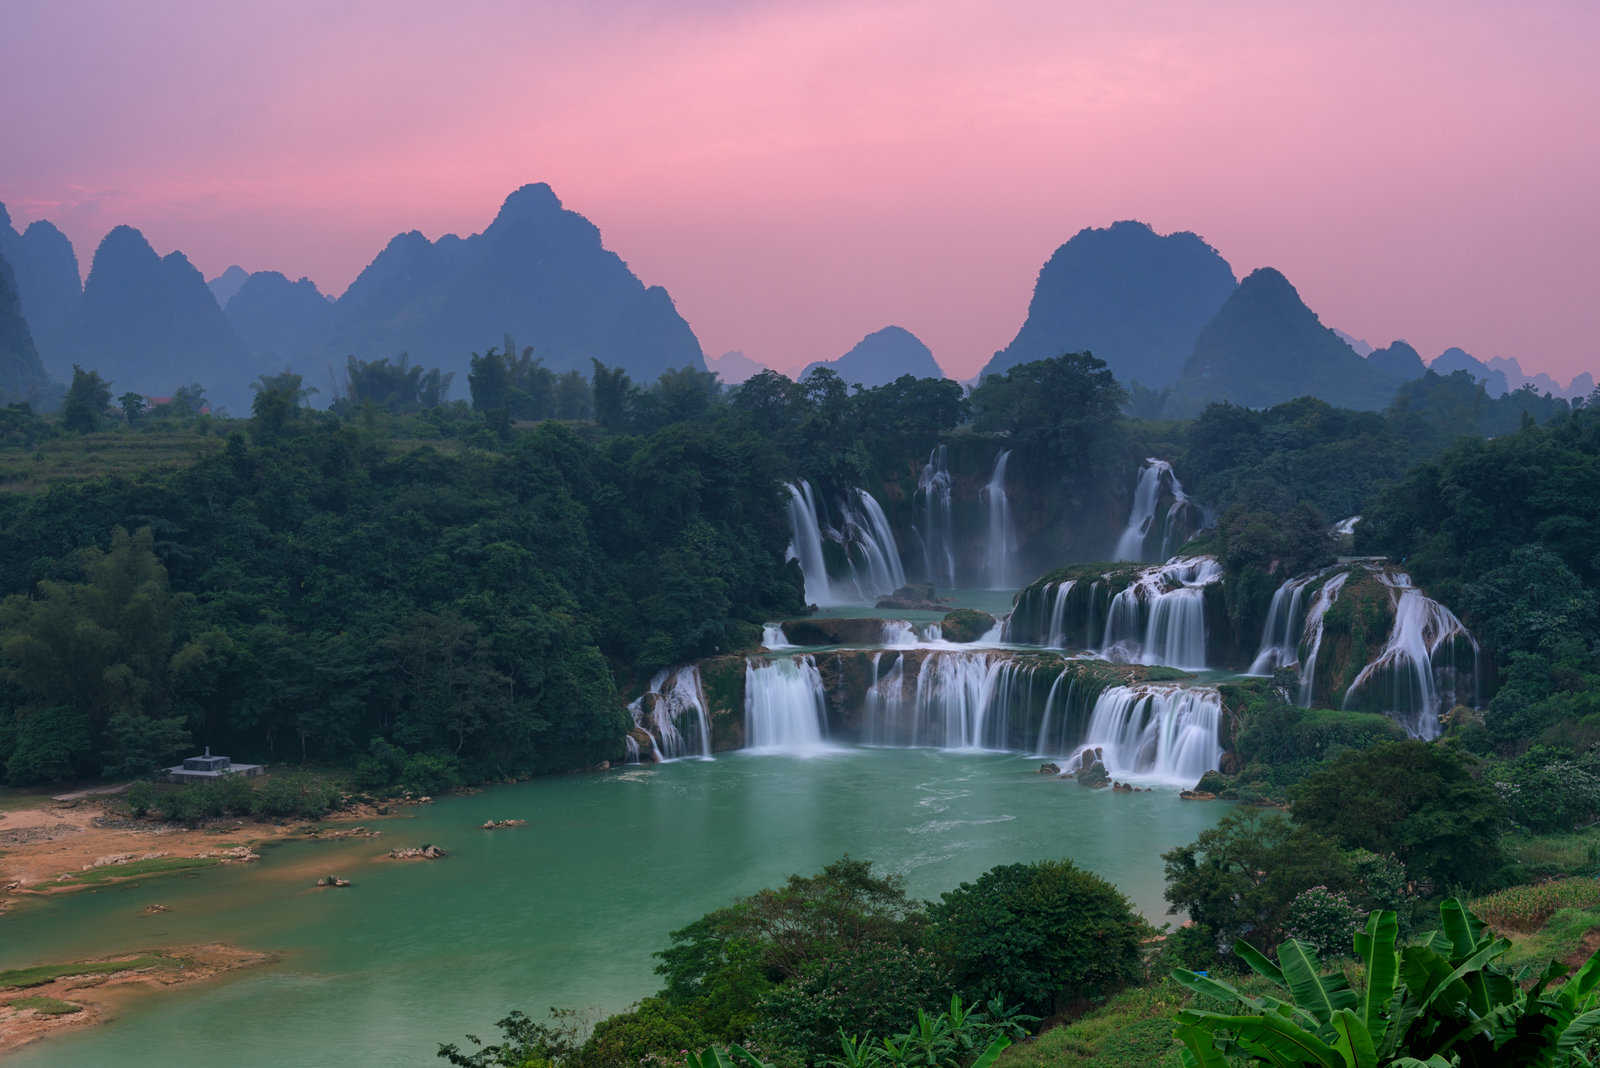 the waterfall effect of vietnam ダイナミックな落水音をとどろかせる、スケールの大きい滝の音の効果音です。1分強でフェードアウトします。sound effect of big waterfall 48khz 24bit wav file 試聴サンプル.